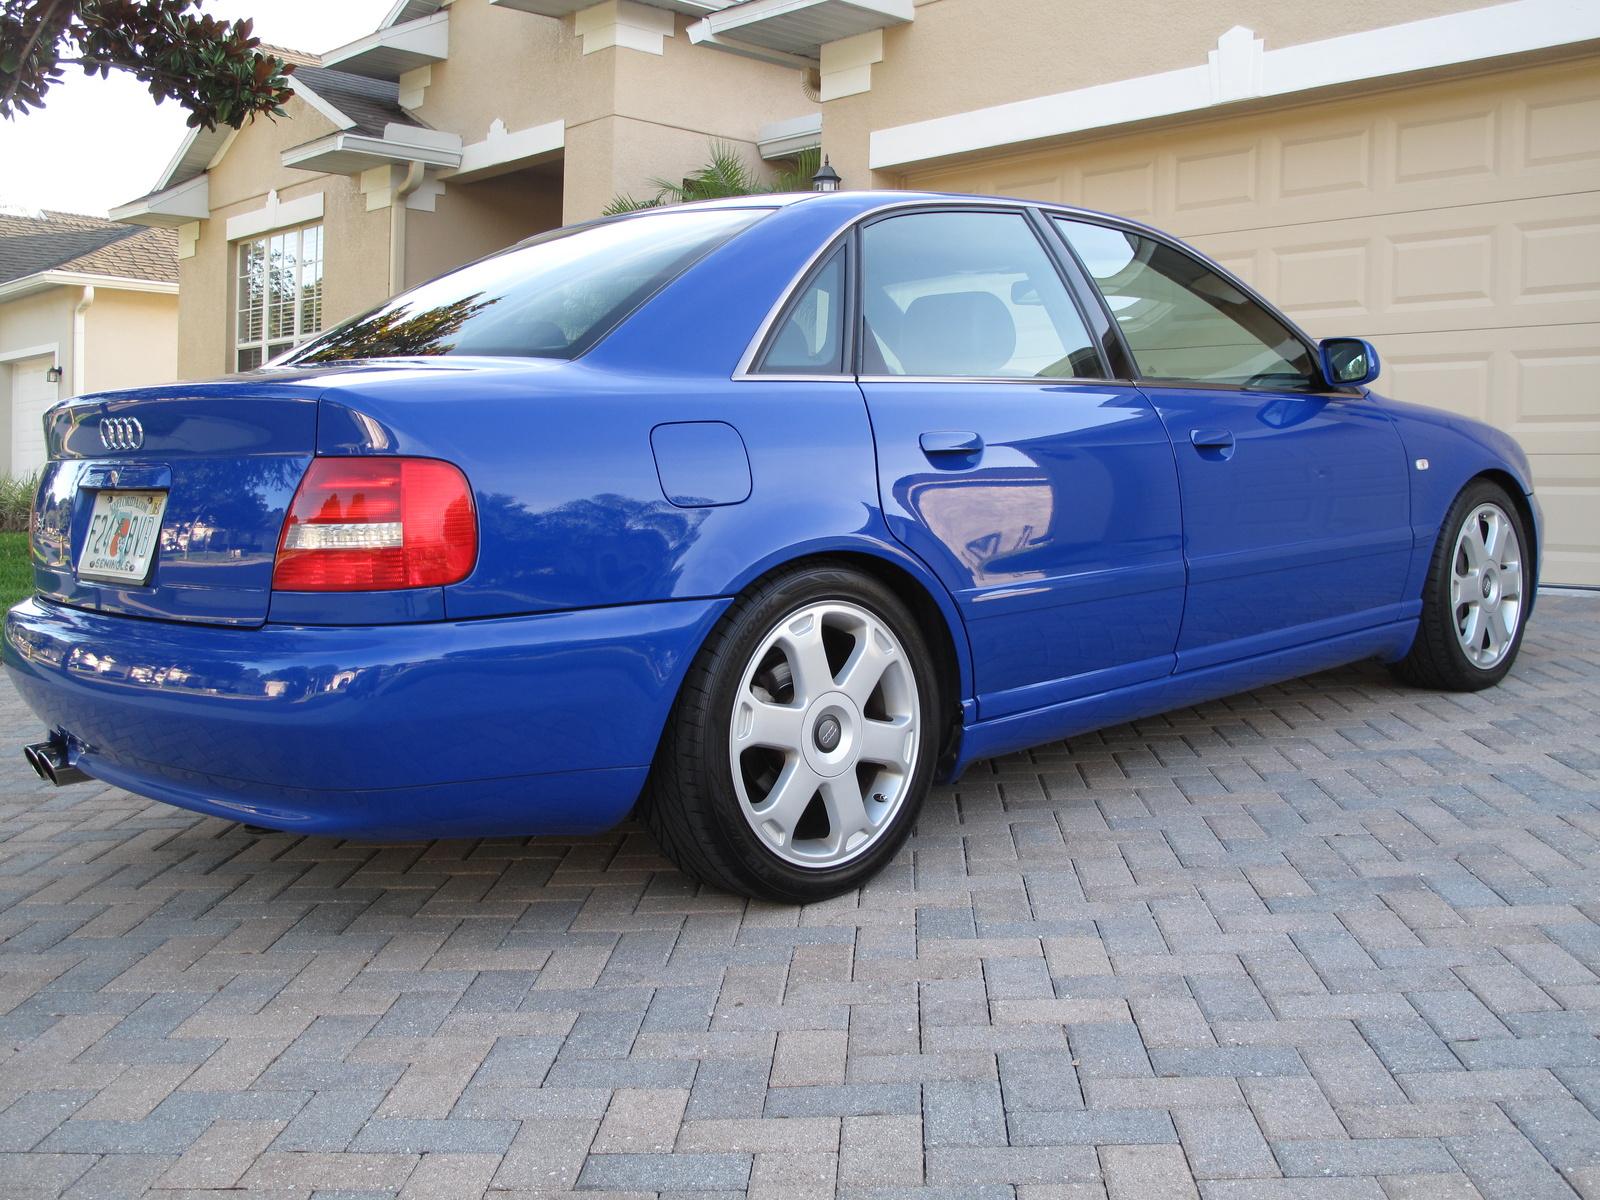 2002 Audi S4 Image 20